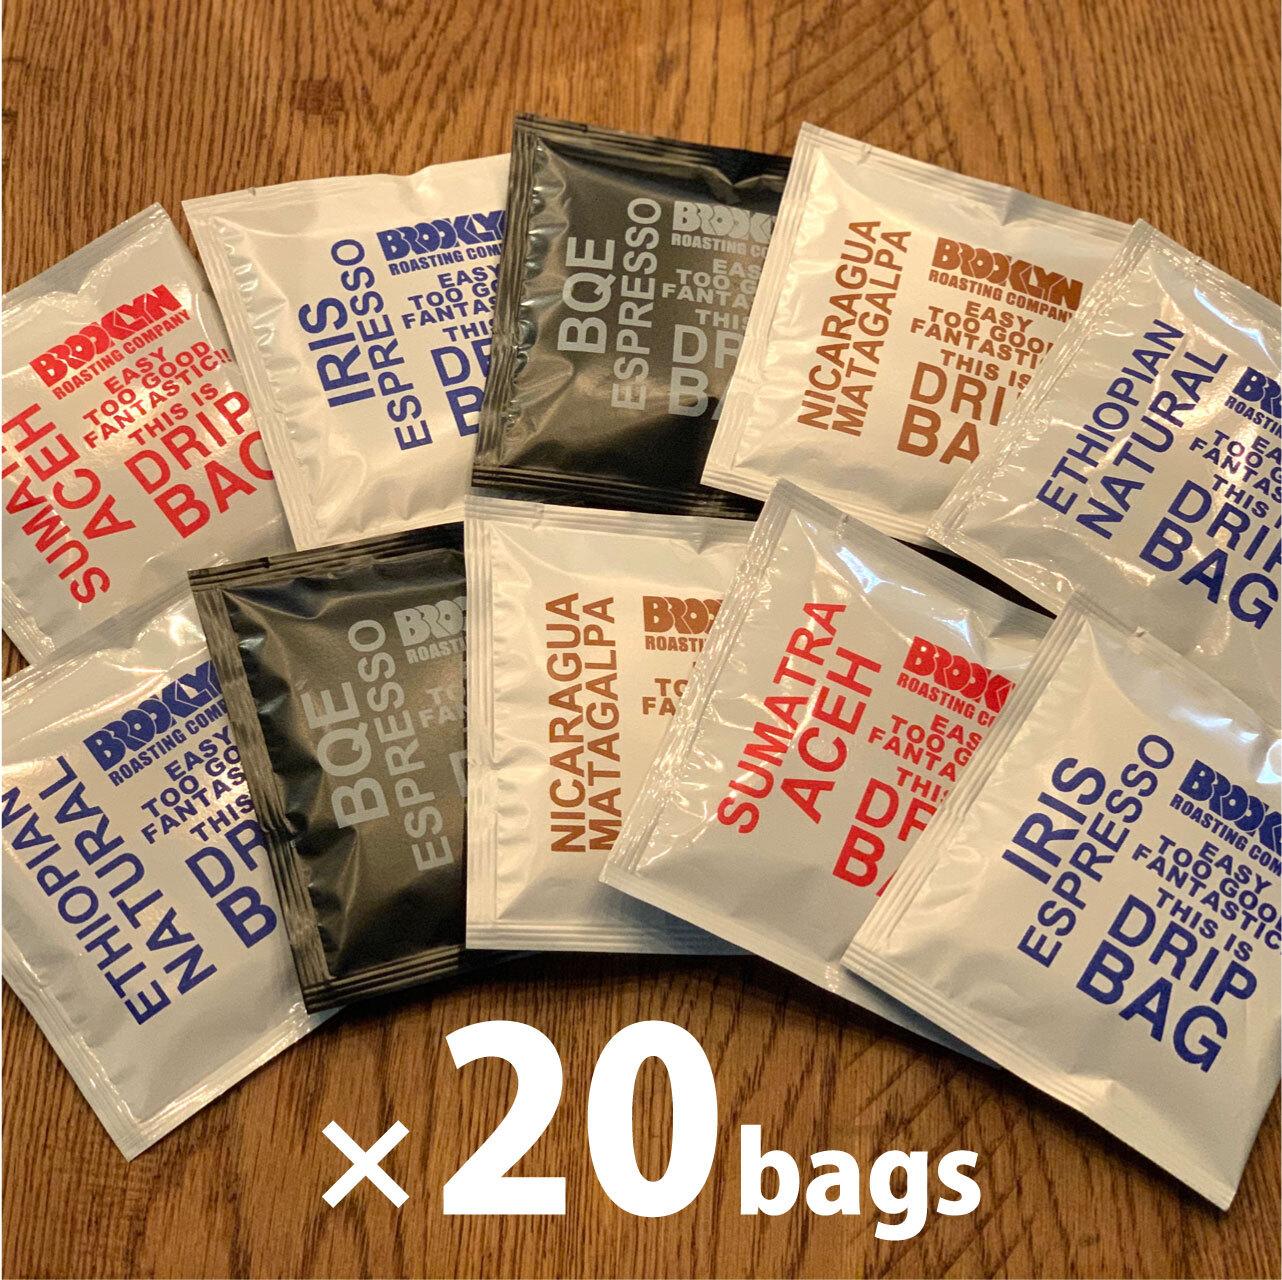 DRIPBAG おまかせ 20pack (Online SHOP限定)